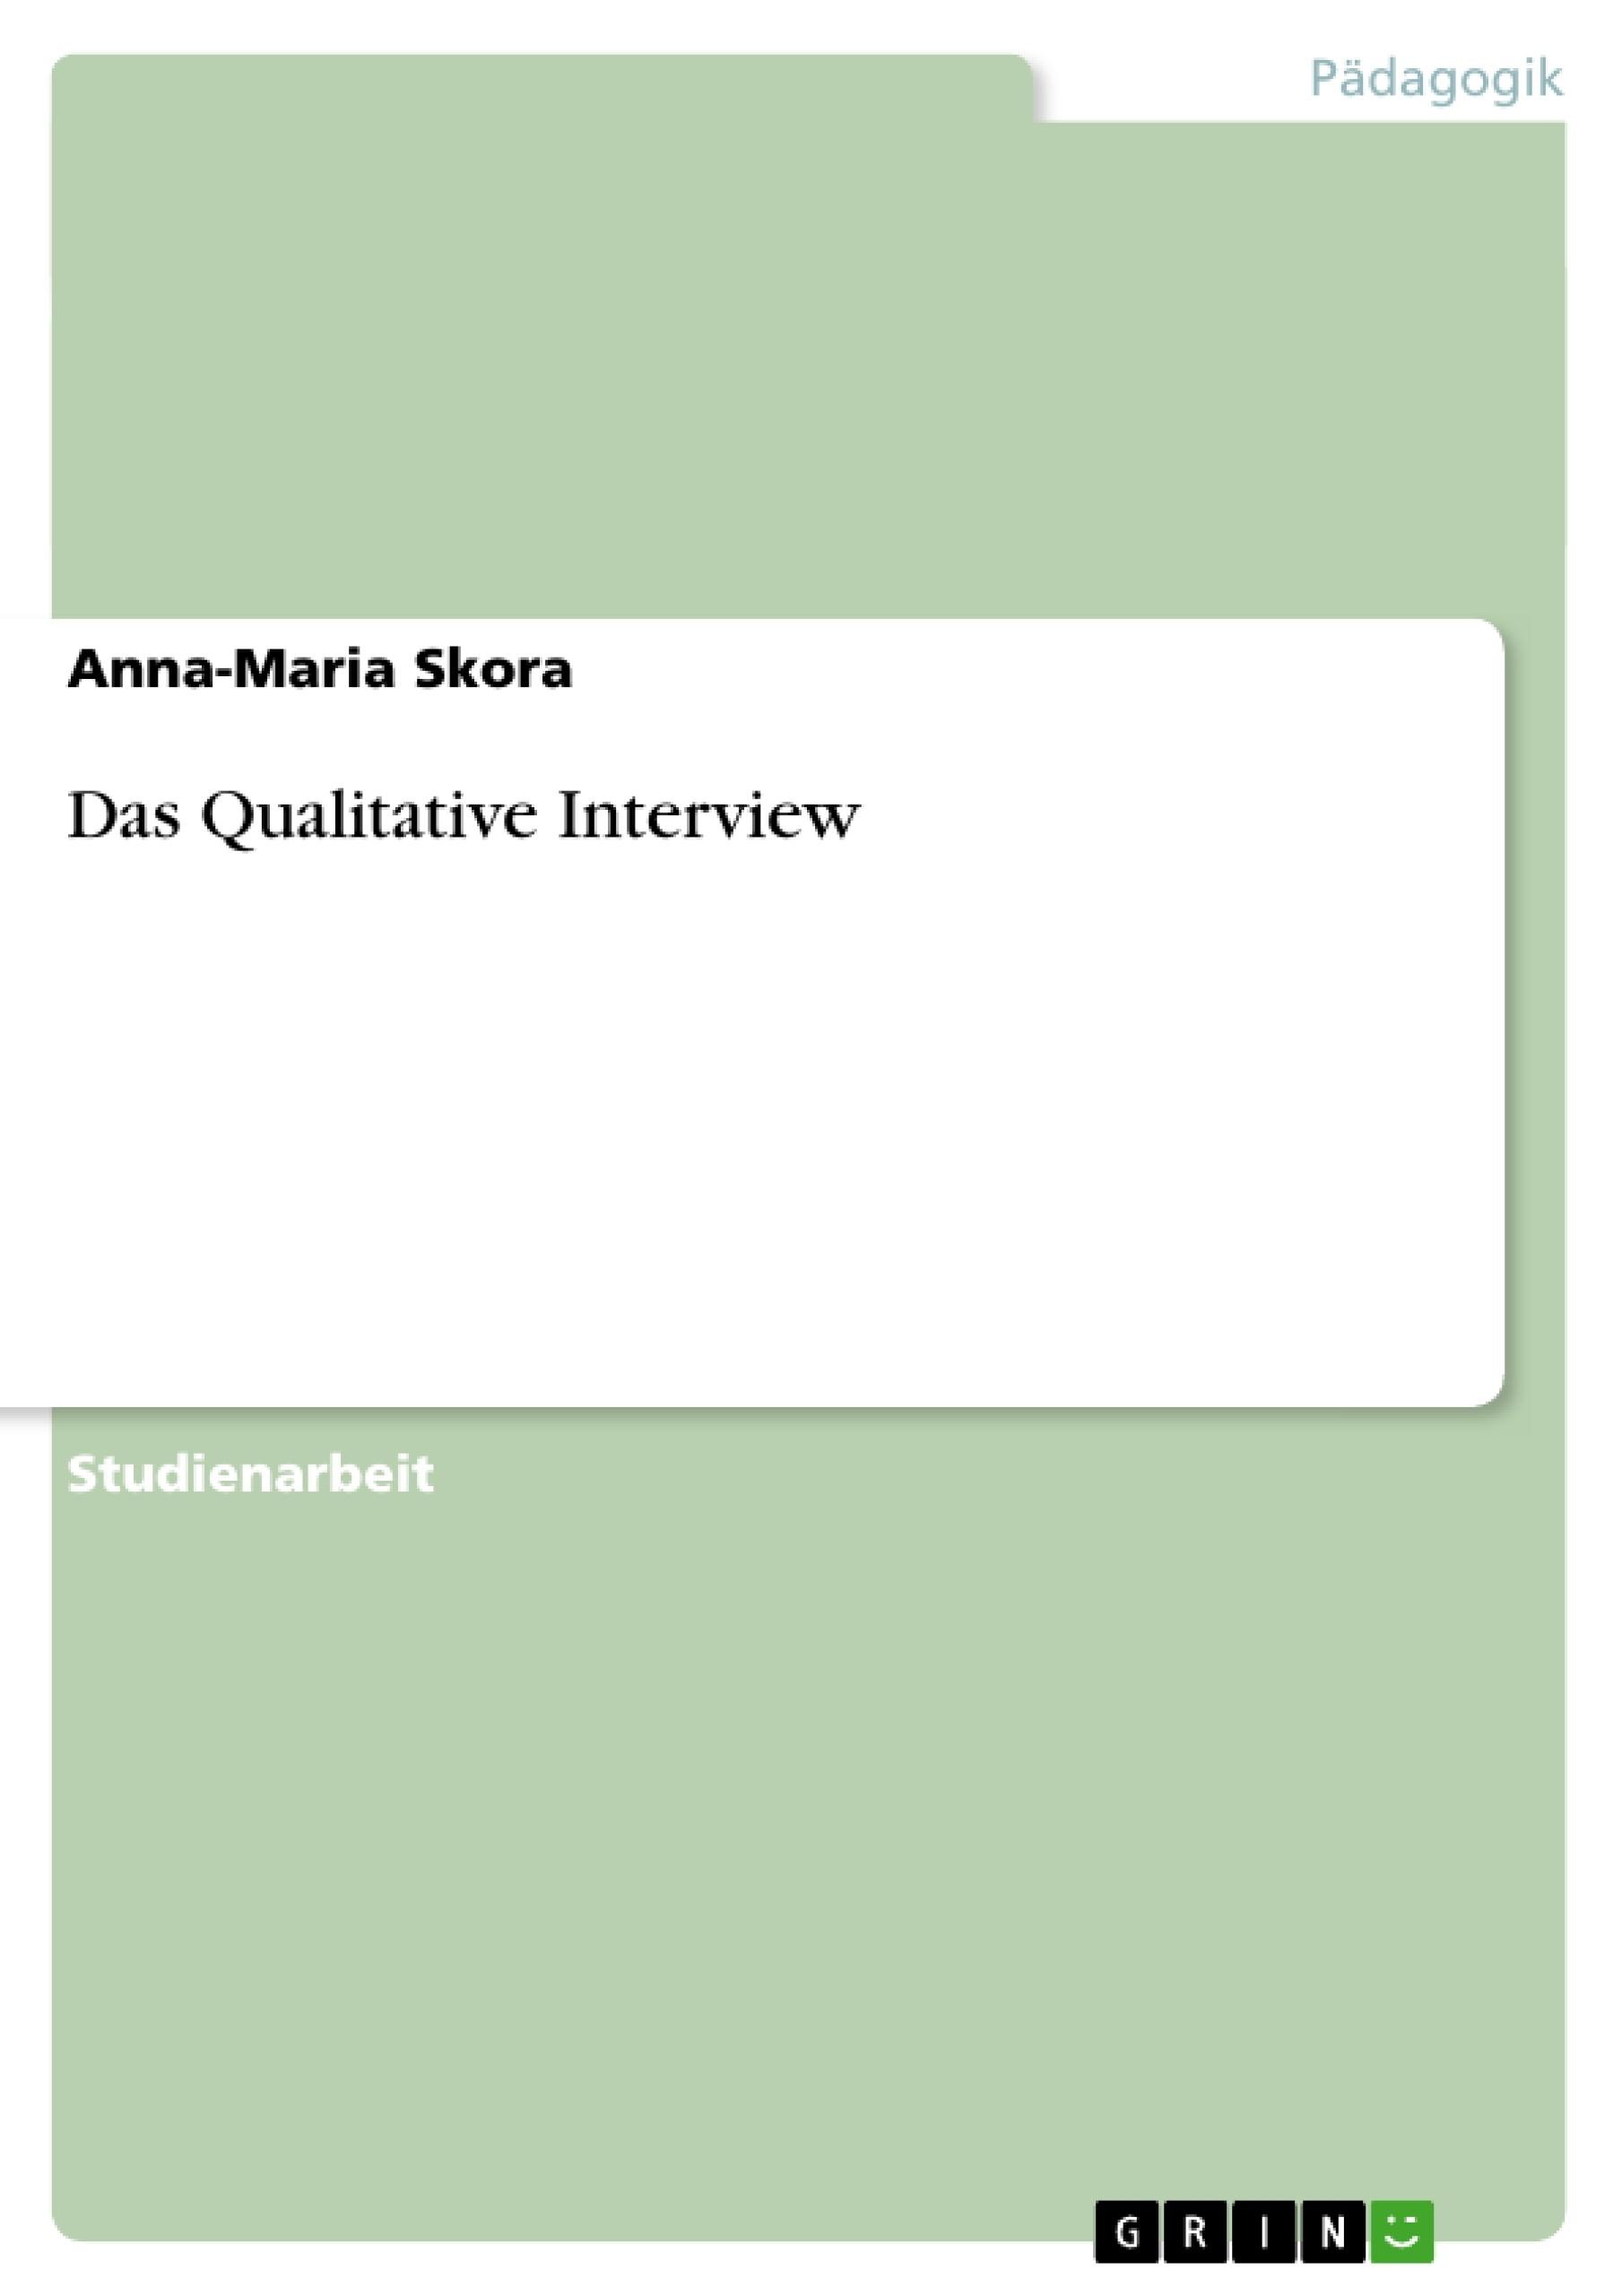 Titel: Das Qualitative Interview